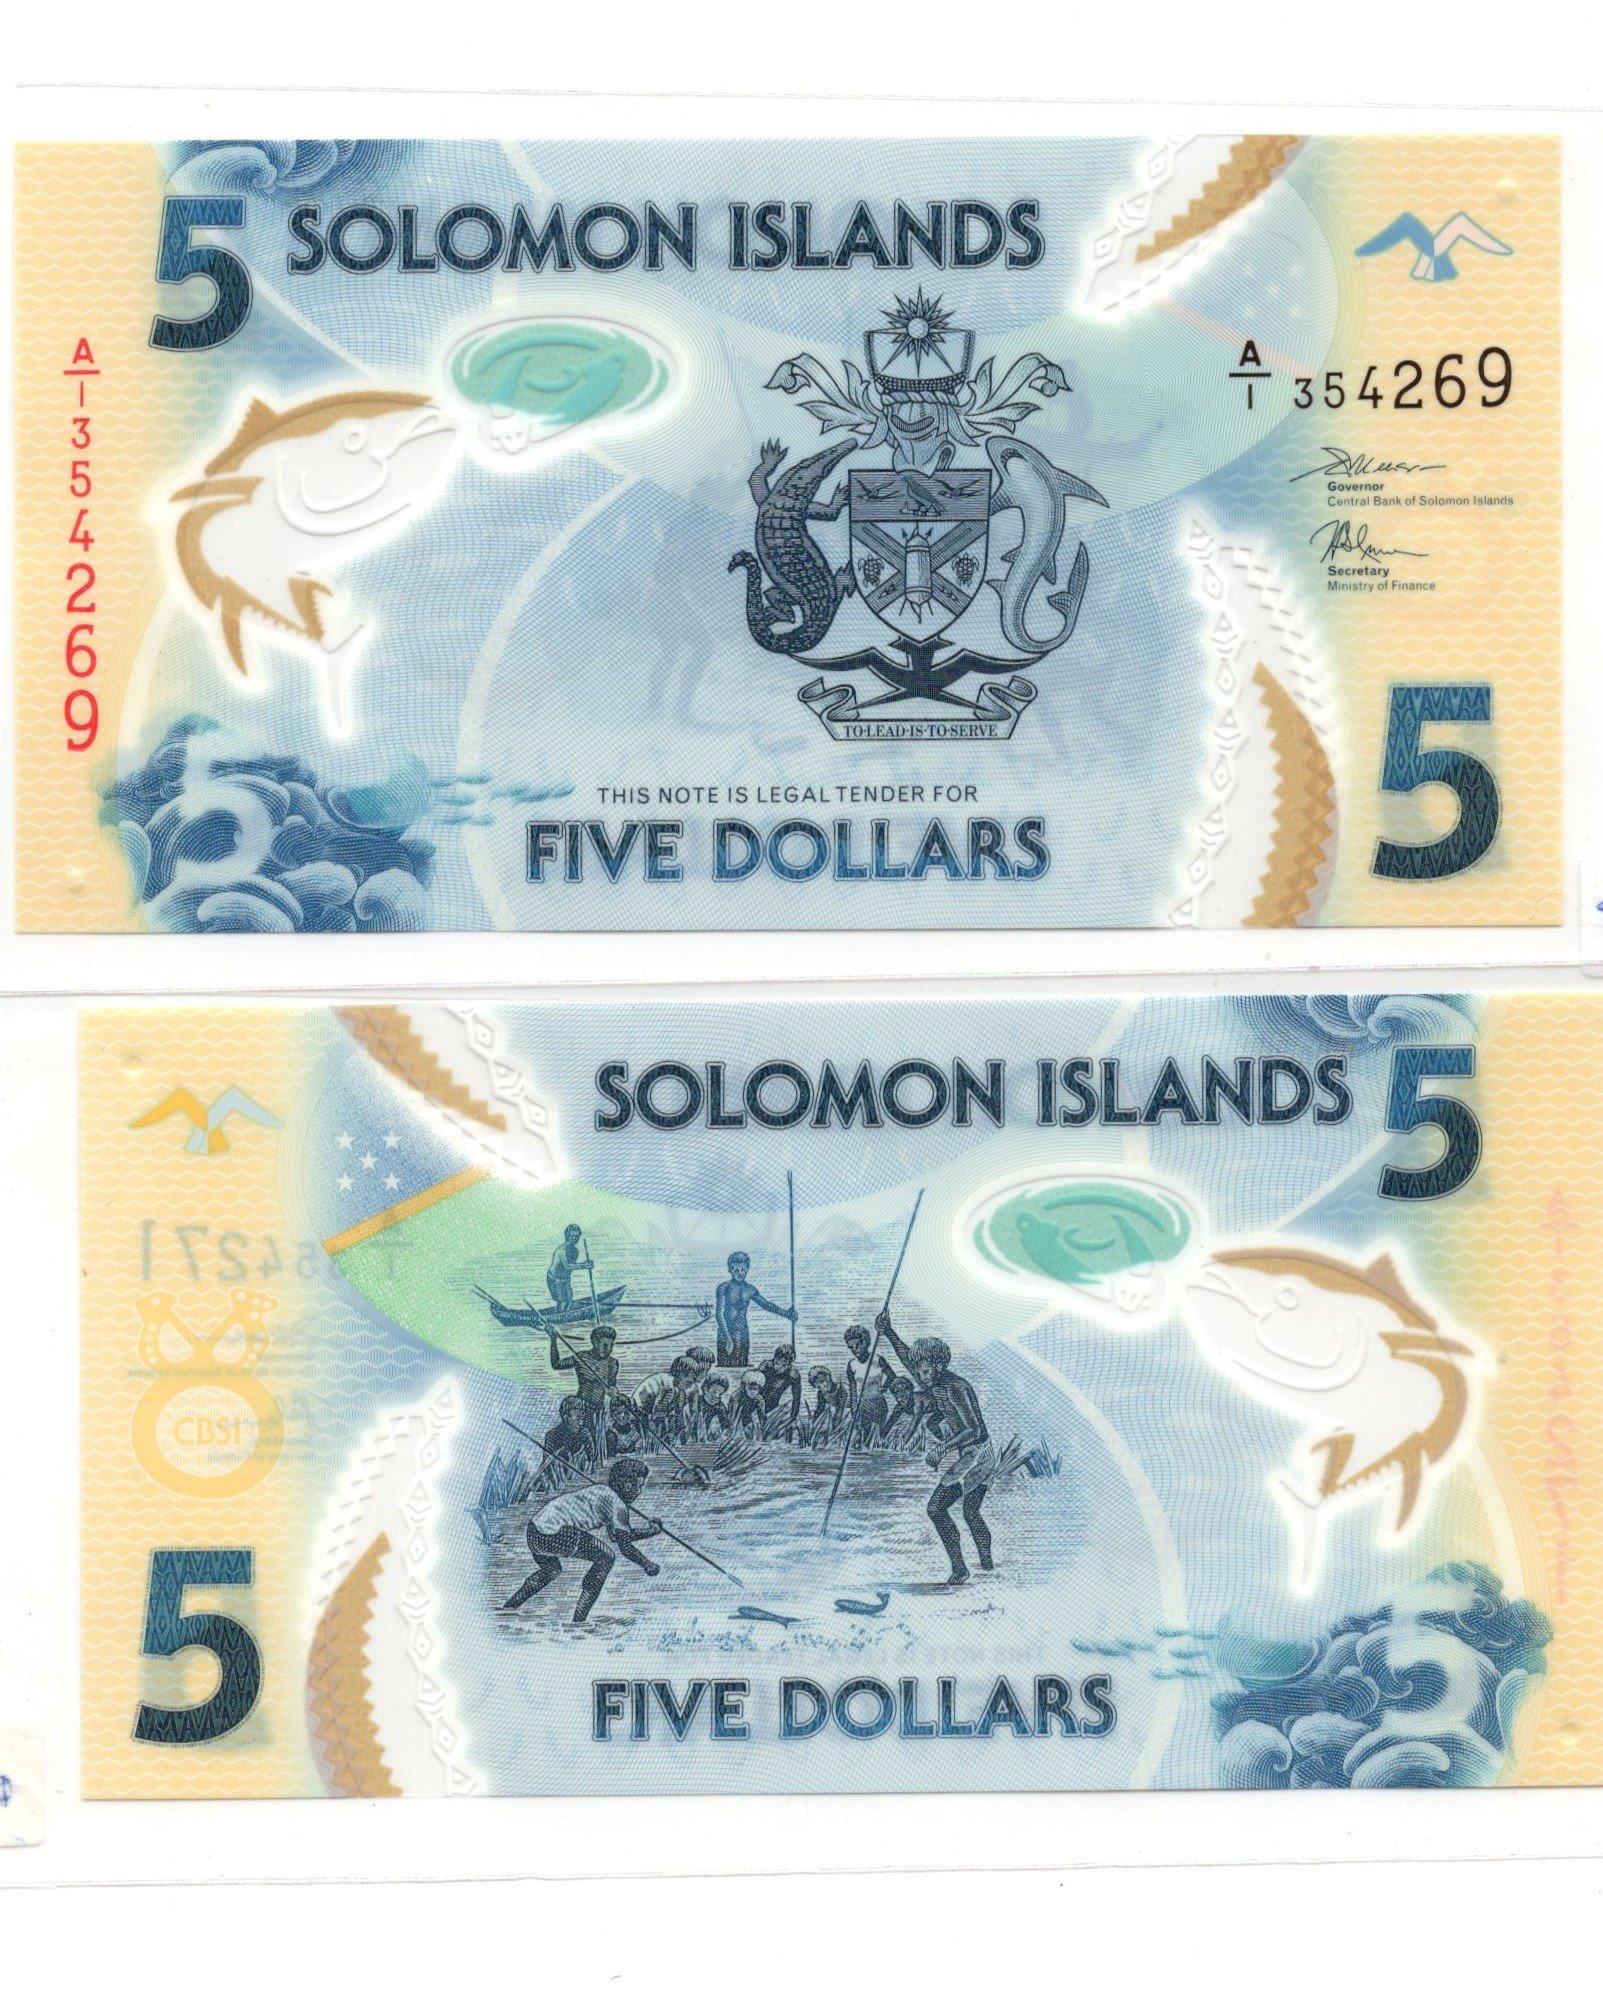 Solomon islands 5 dollars polymer